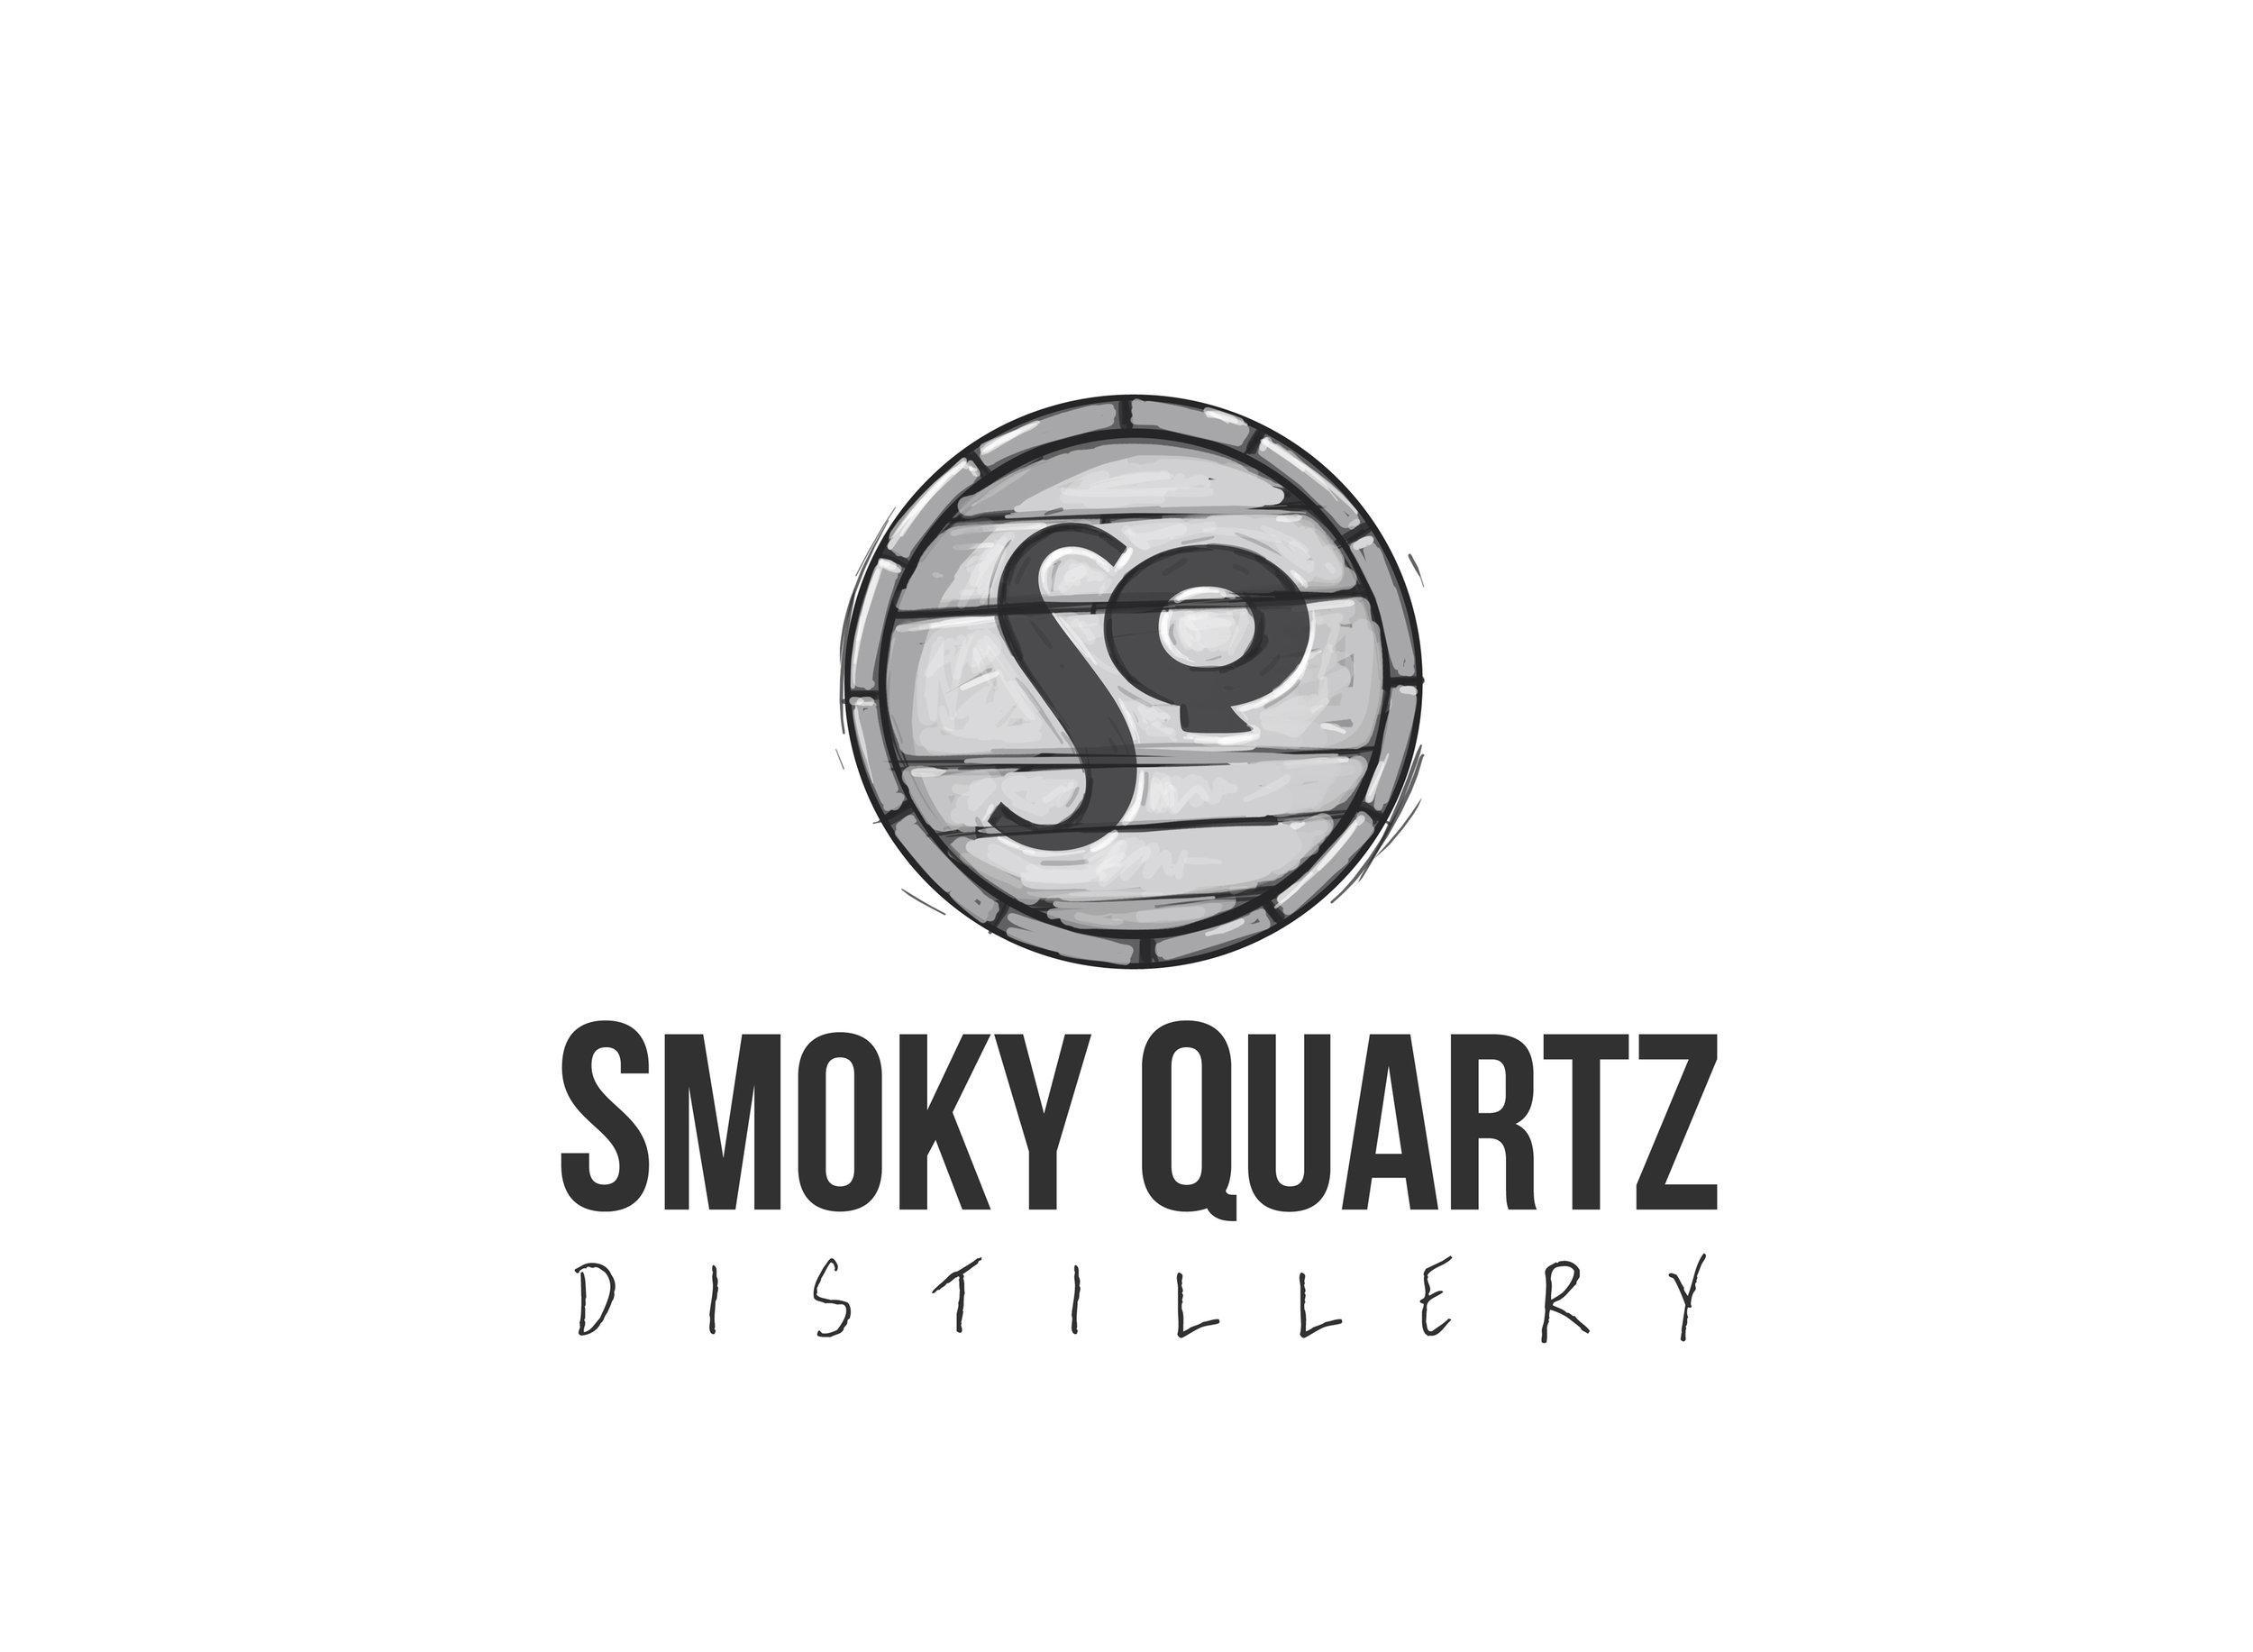 Smokey Quartz Distillery - Logo Concept, Seabrook NH